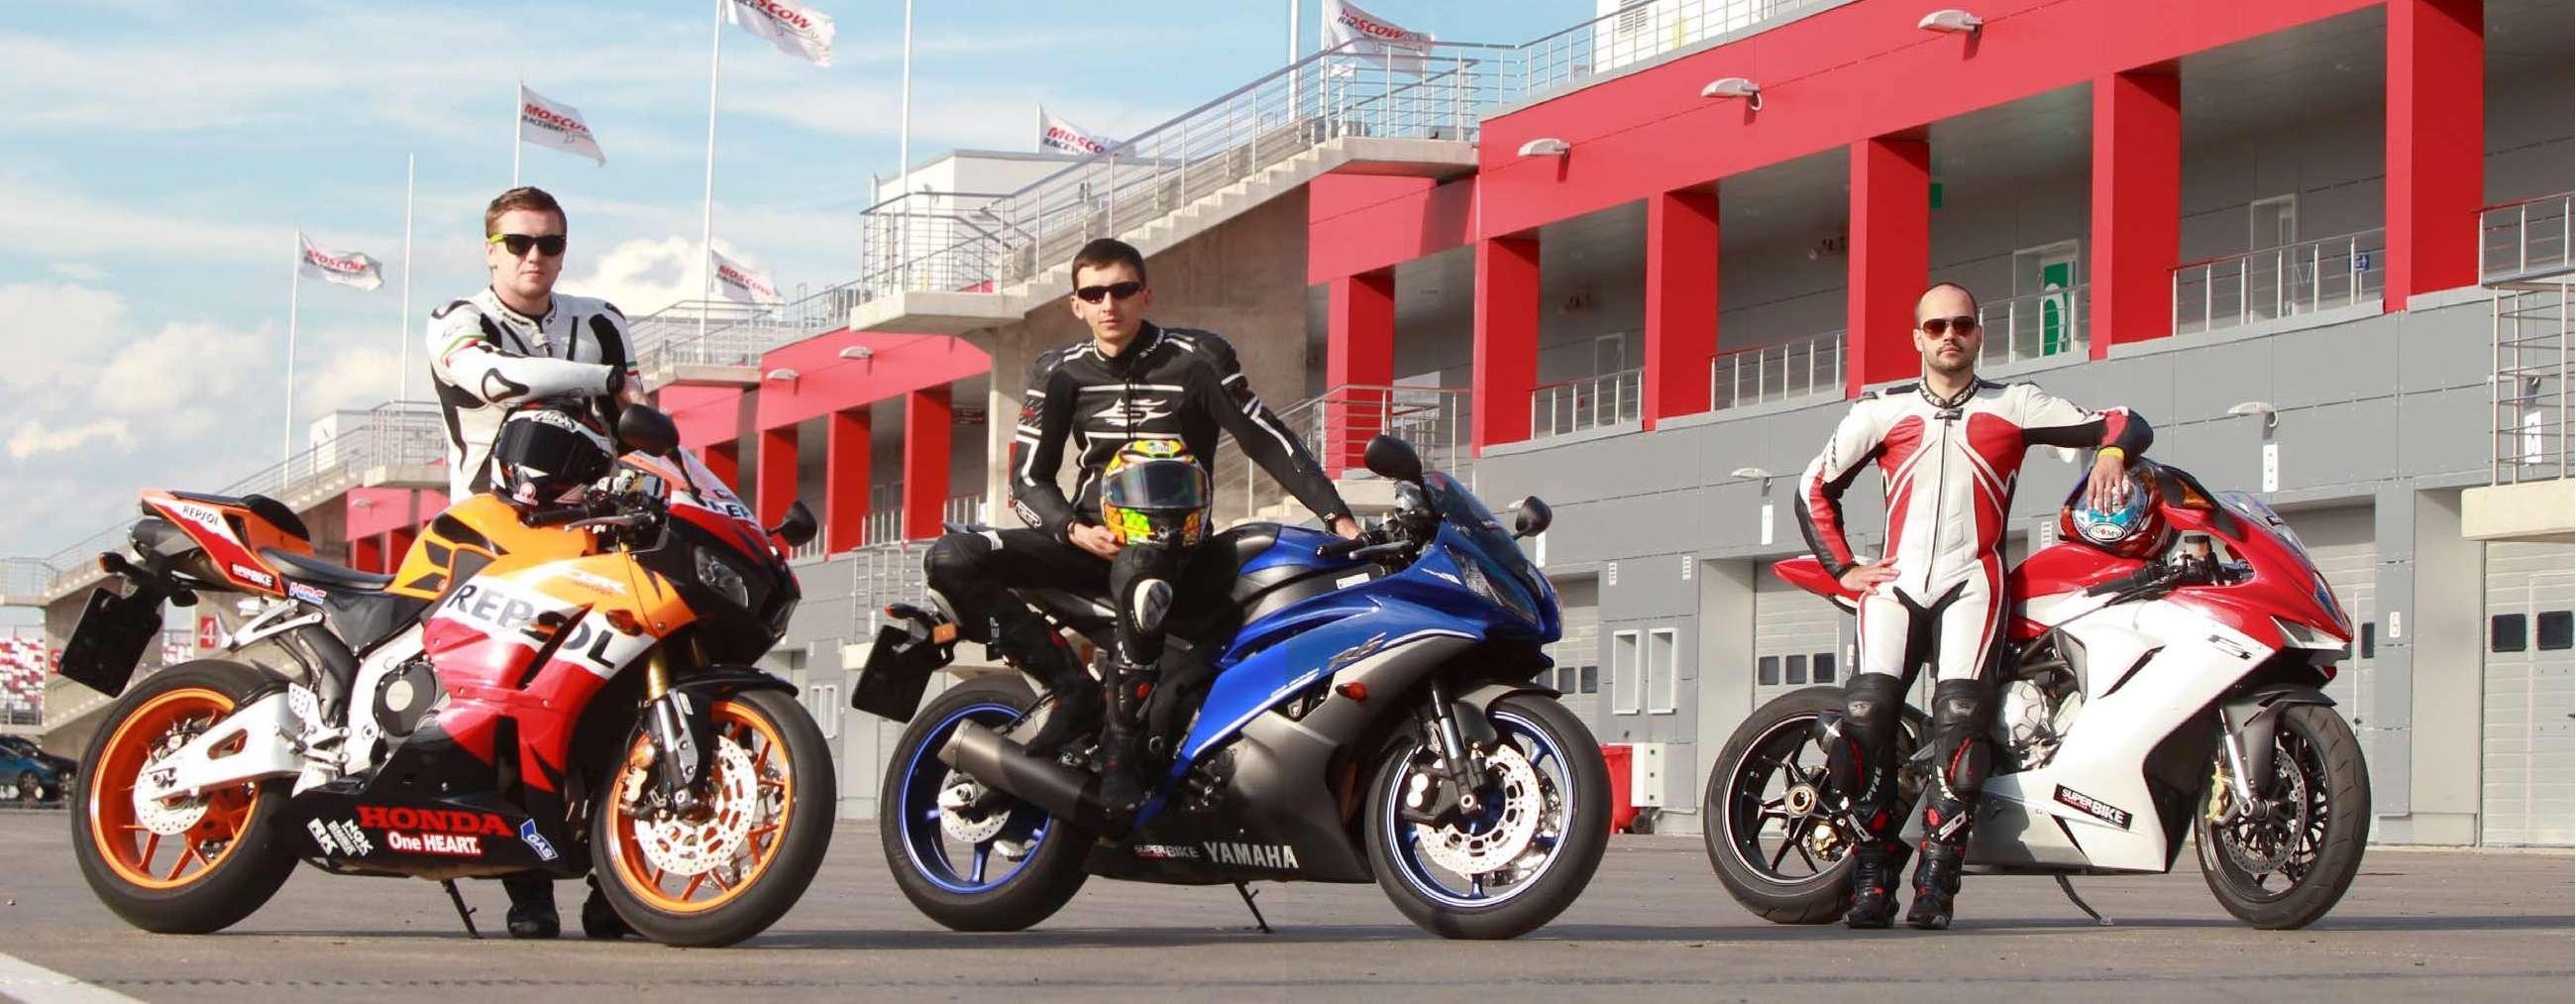 Honda CBR600RR Yamaha YZF-R6 MV Agusta F3 675